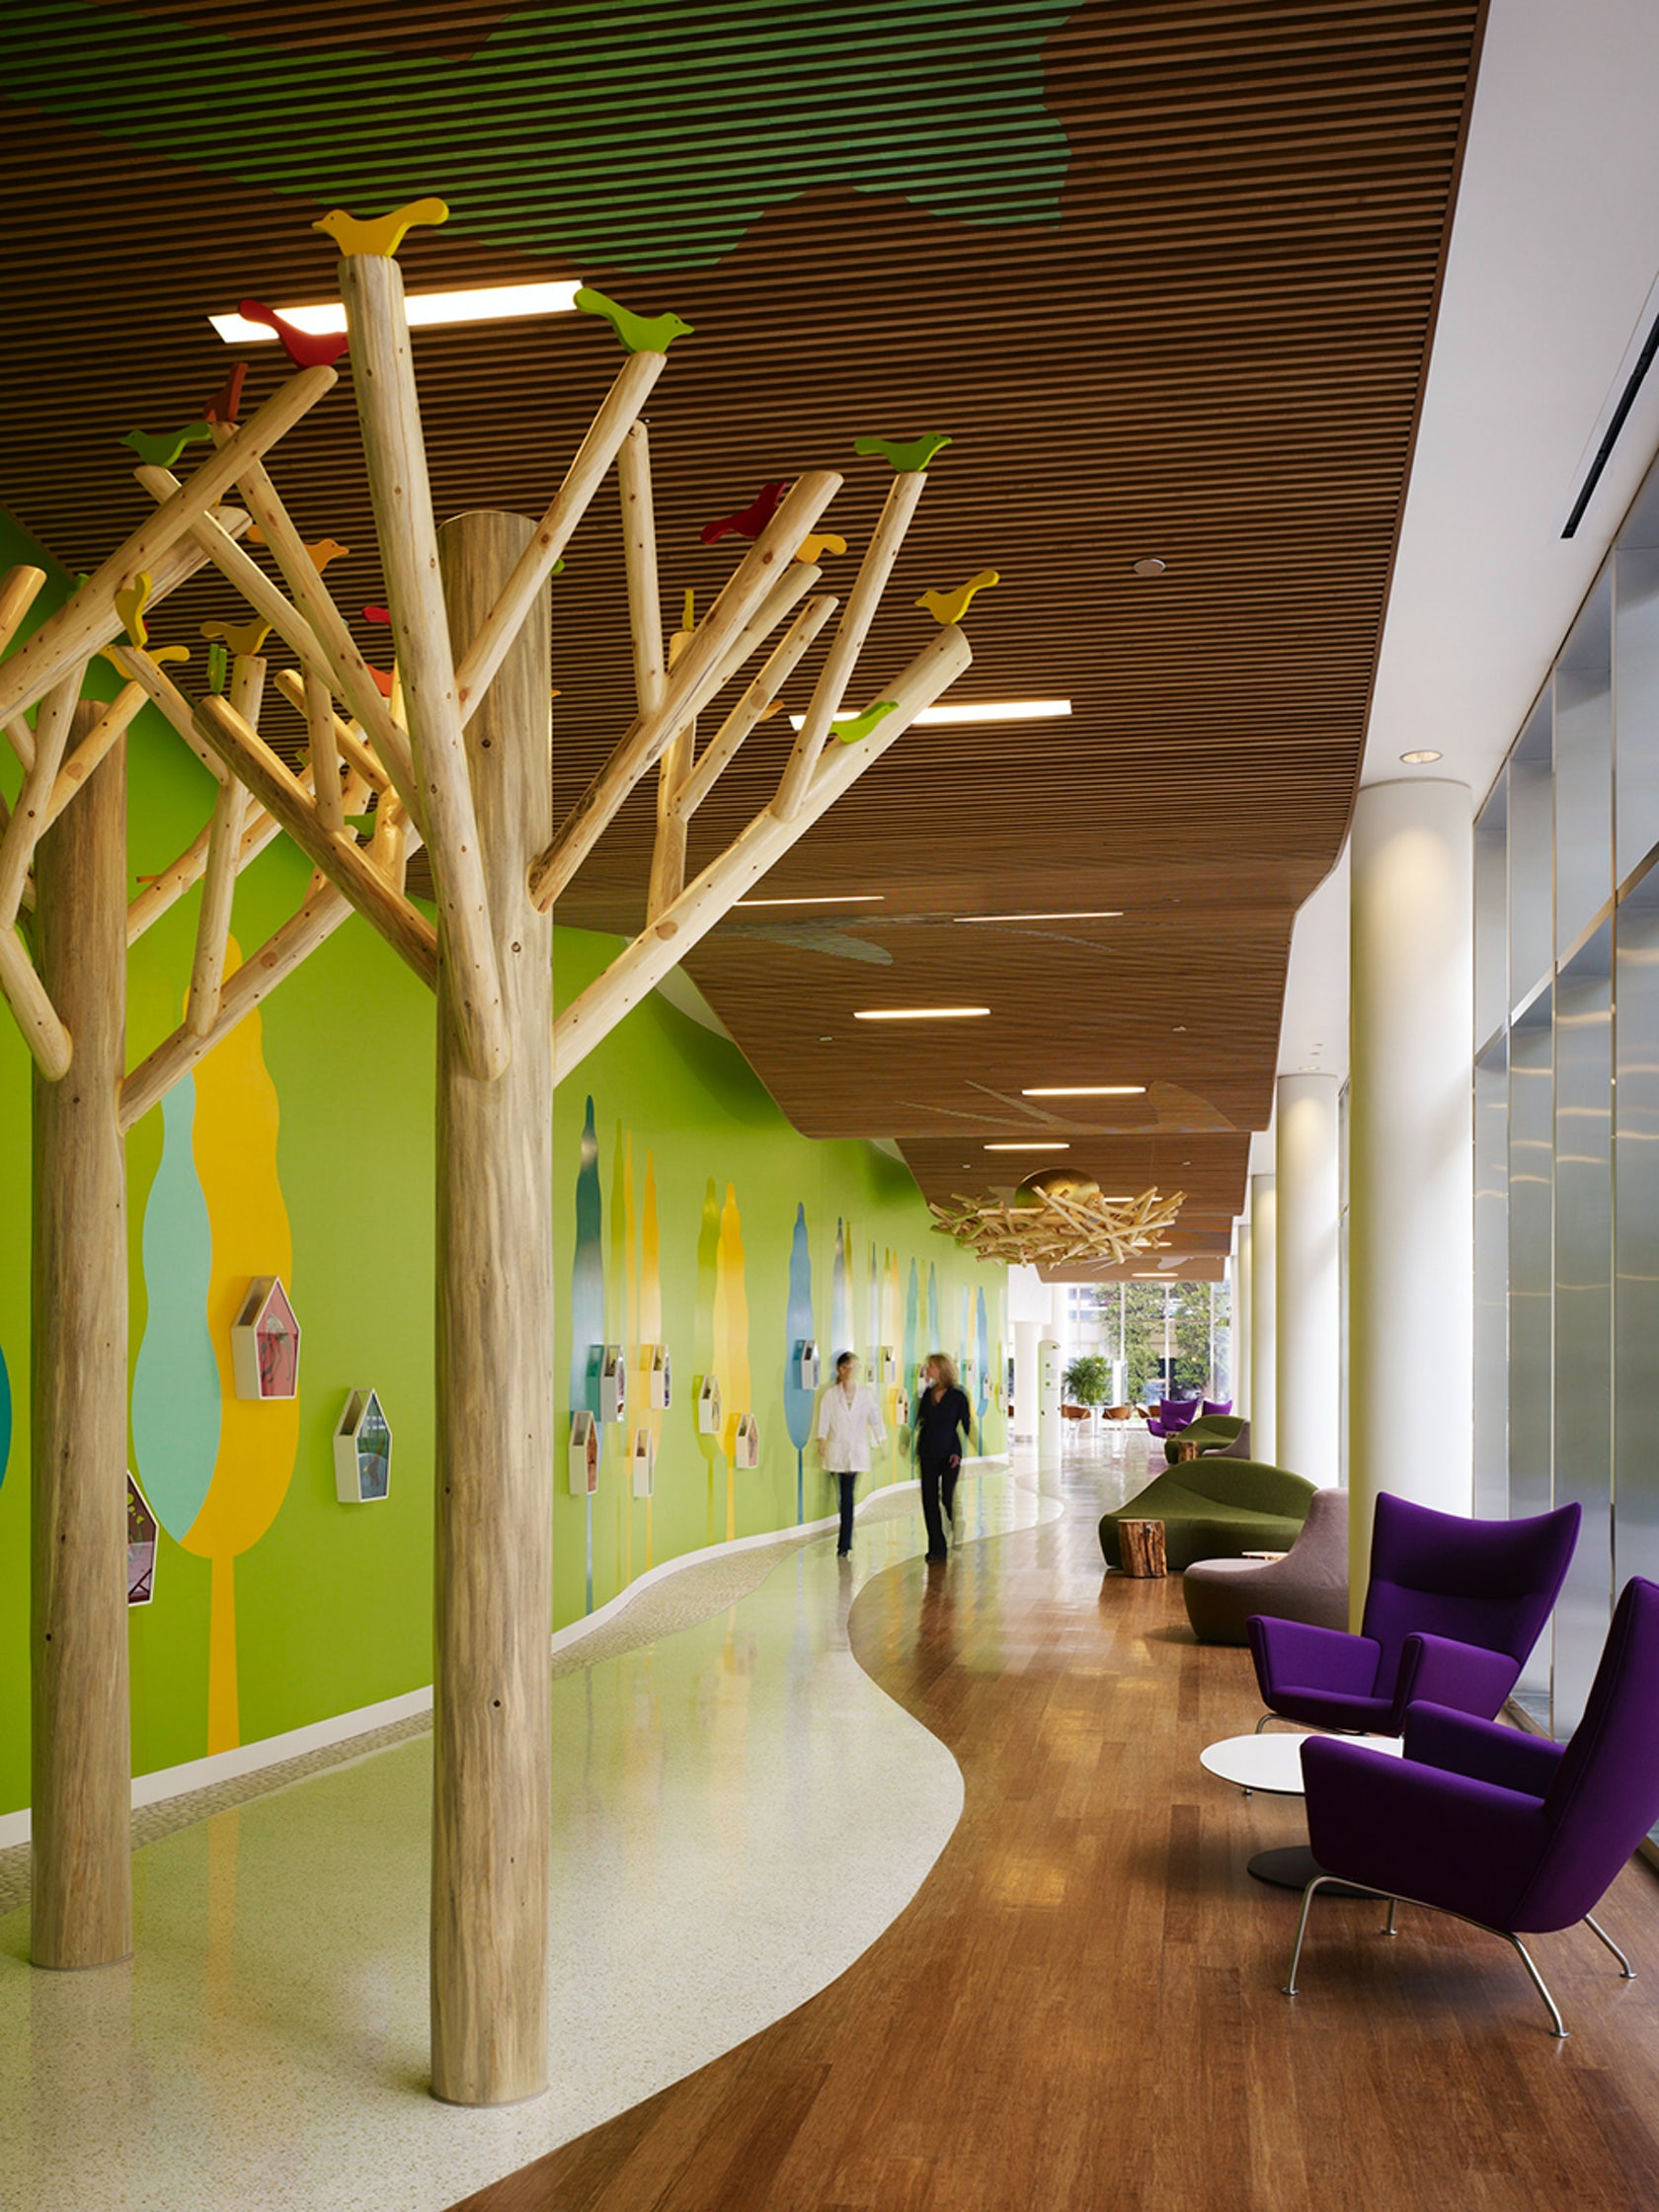 Hospital Room Interior Design: Randall Children's Hospital At Legacy Emanuel